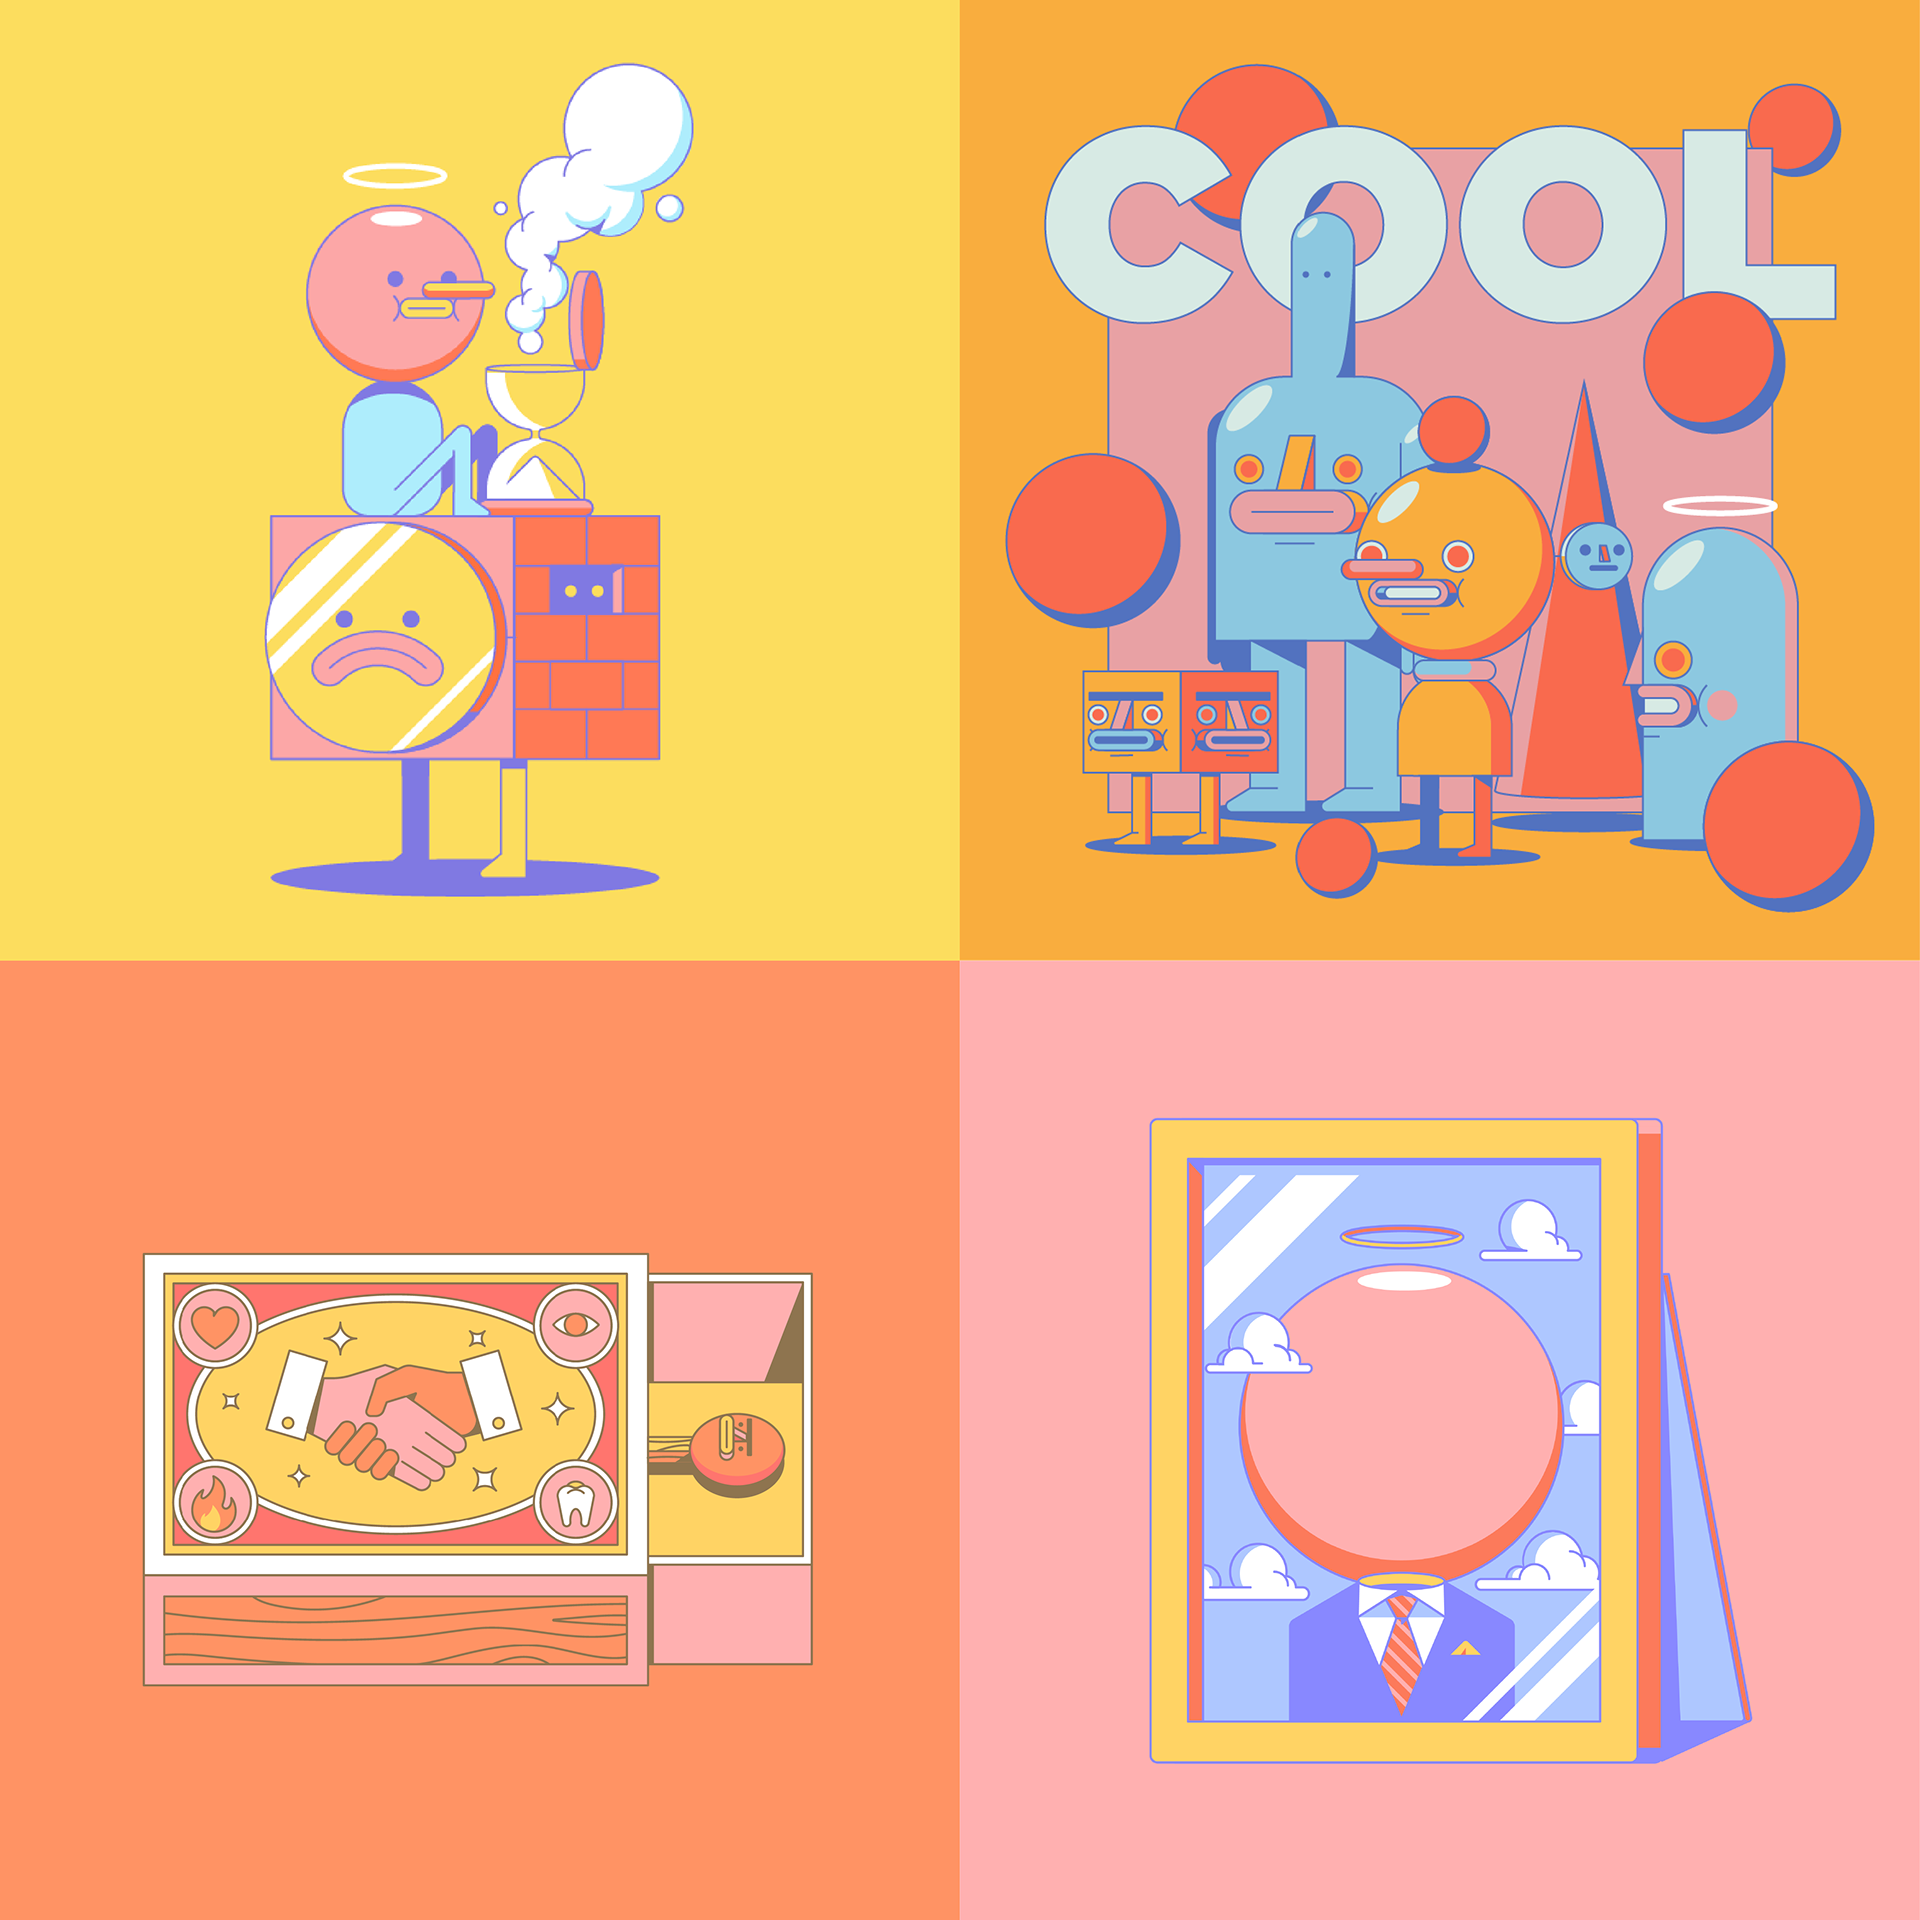 Graphic Design, Illustration, Digital Art